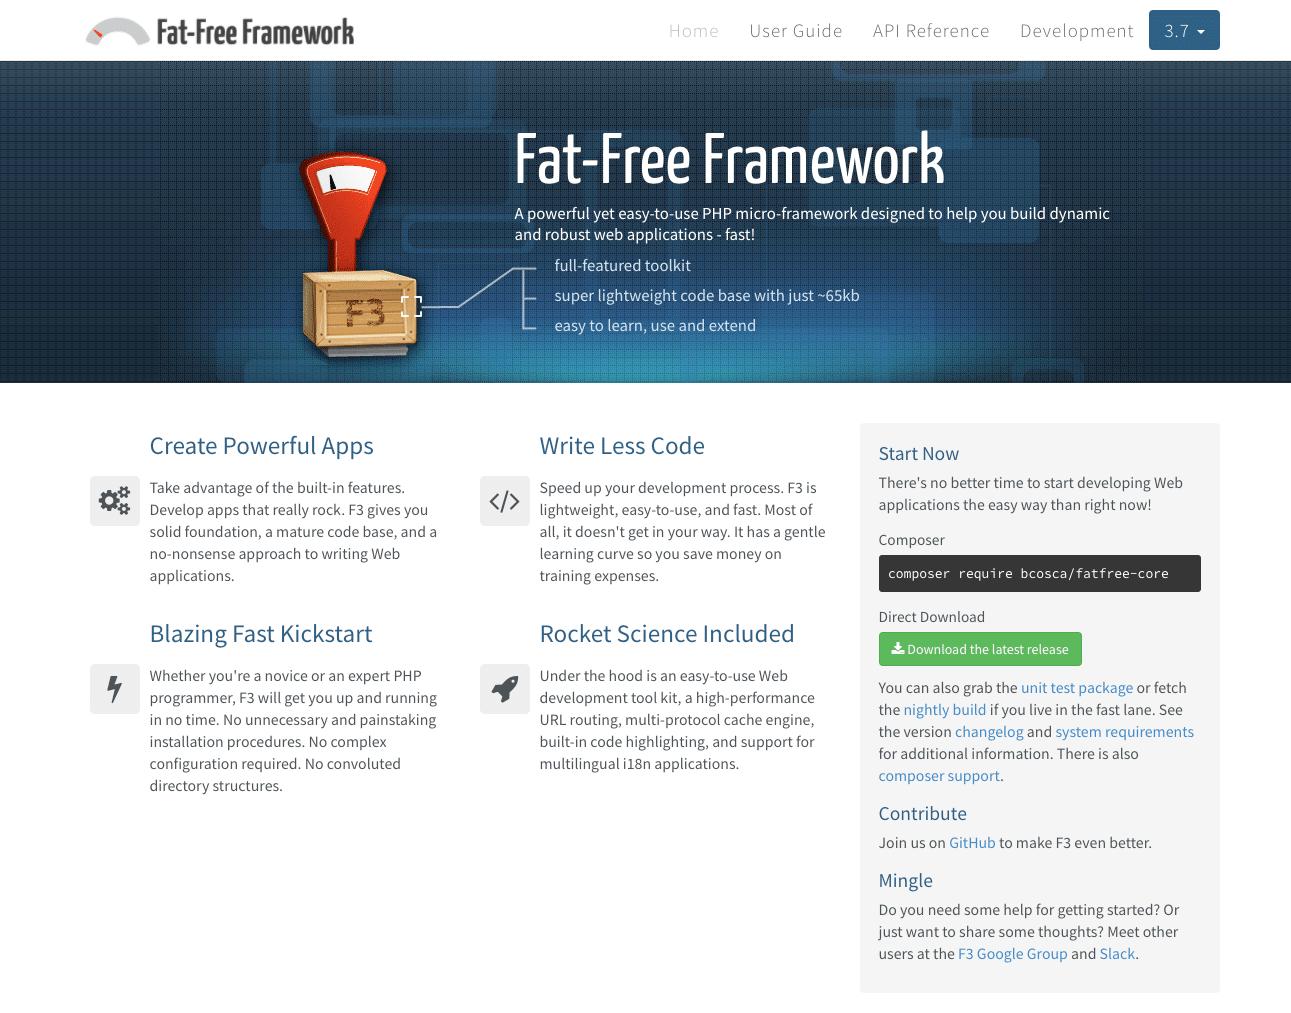 Fat-Free Framework